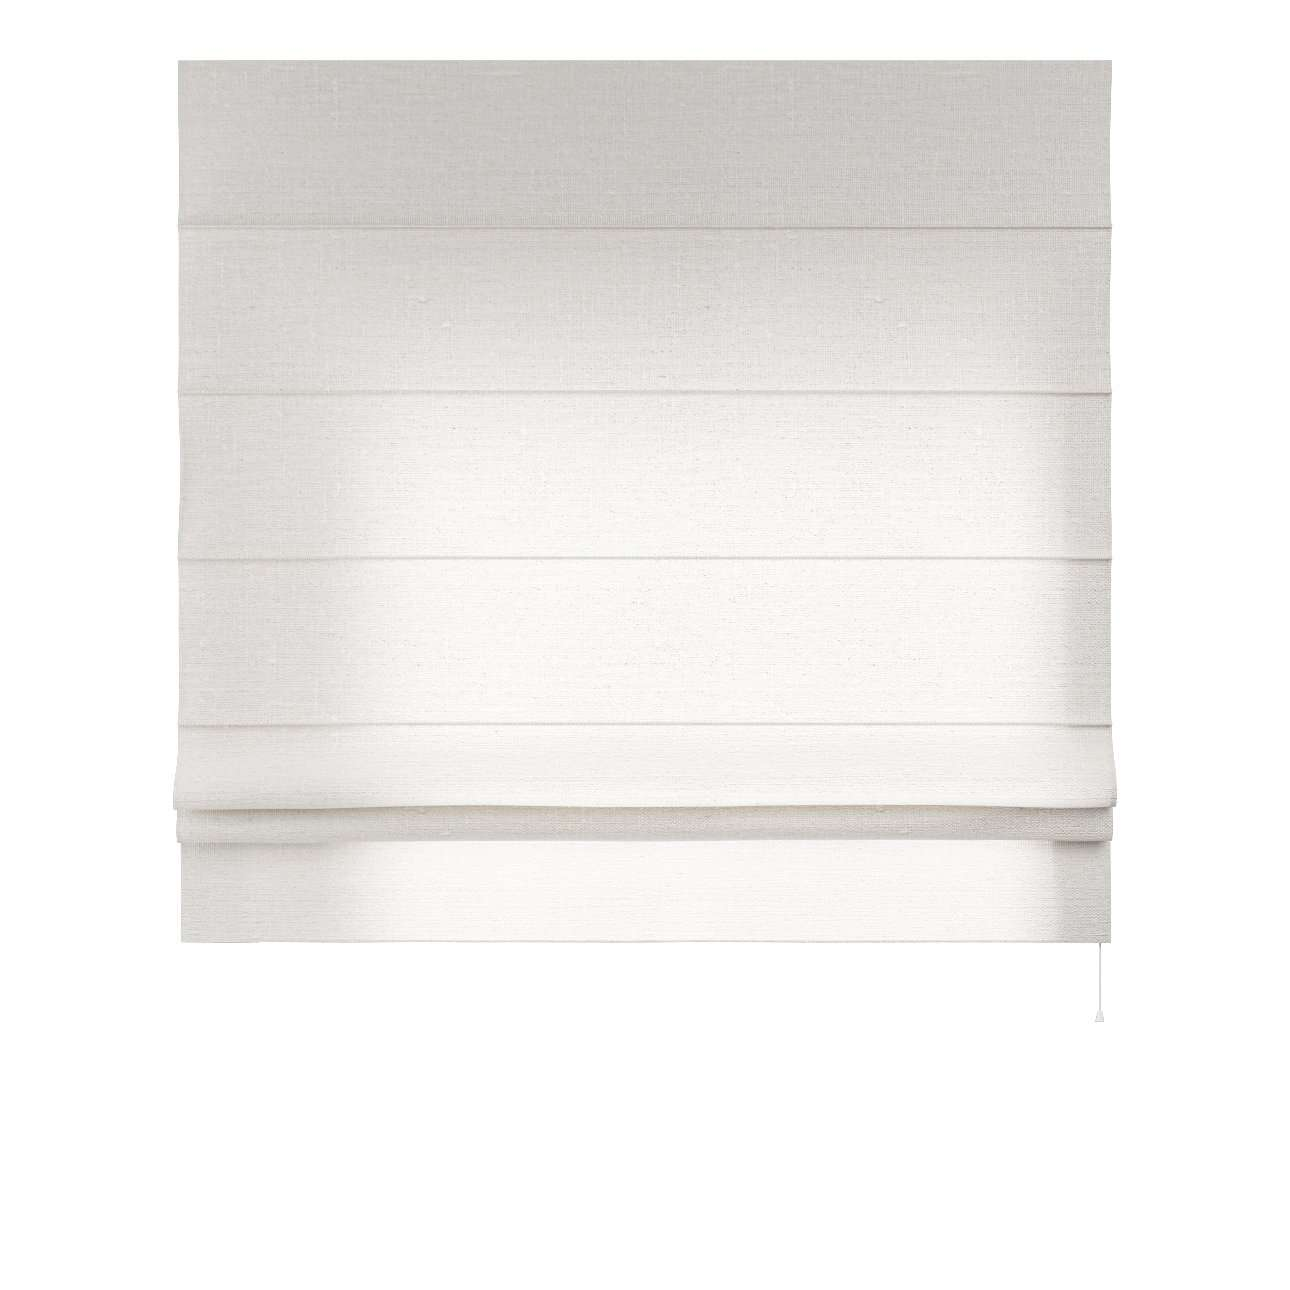 Romanetės Padva 80 x 170 cm (plotis x ilgis) kolekcijoje Linen , audinys: 392-04